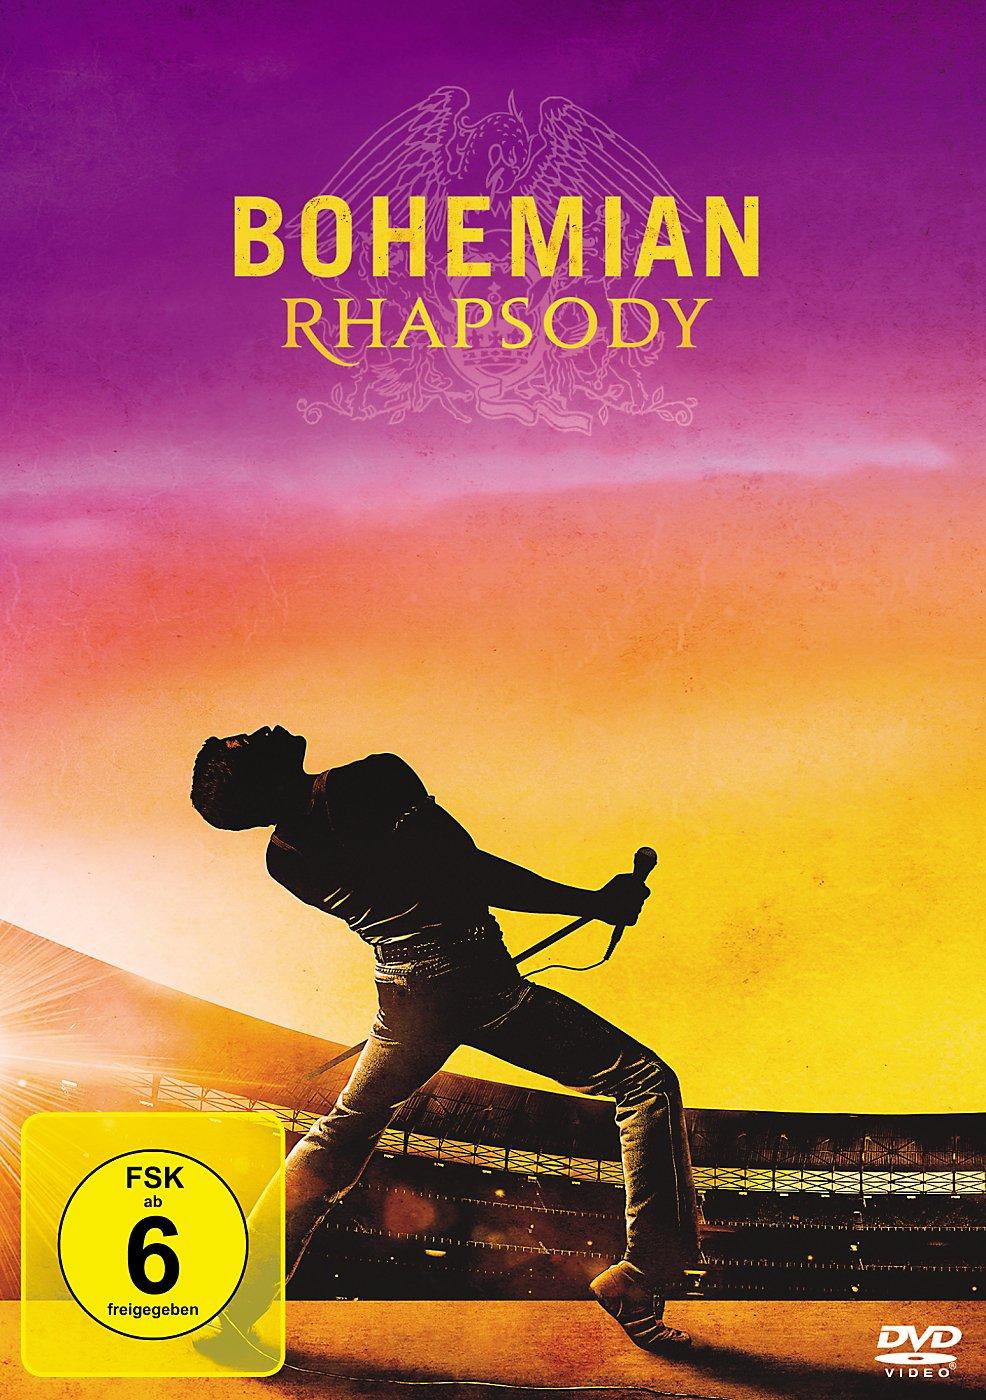 Bohemian Rhapsody Dvd Jetzt Bei Weltbild De Online Bestellen